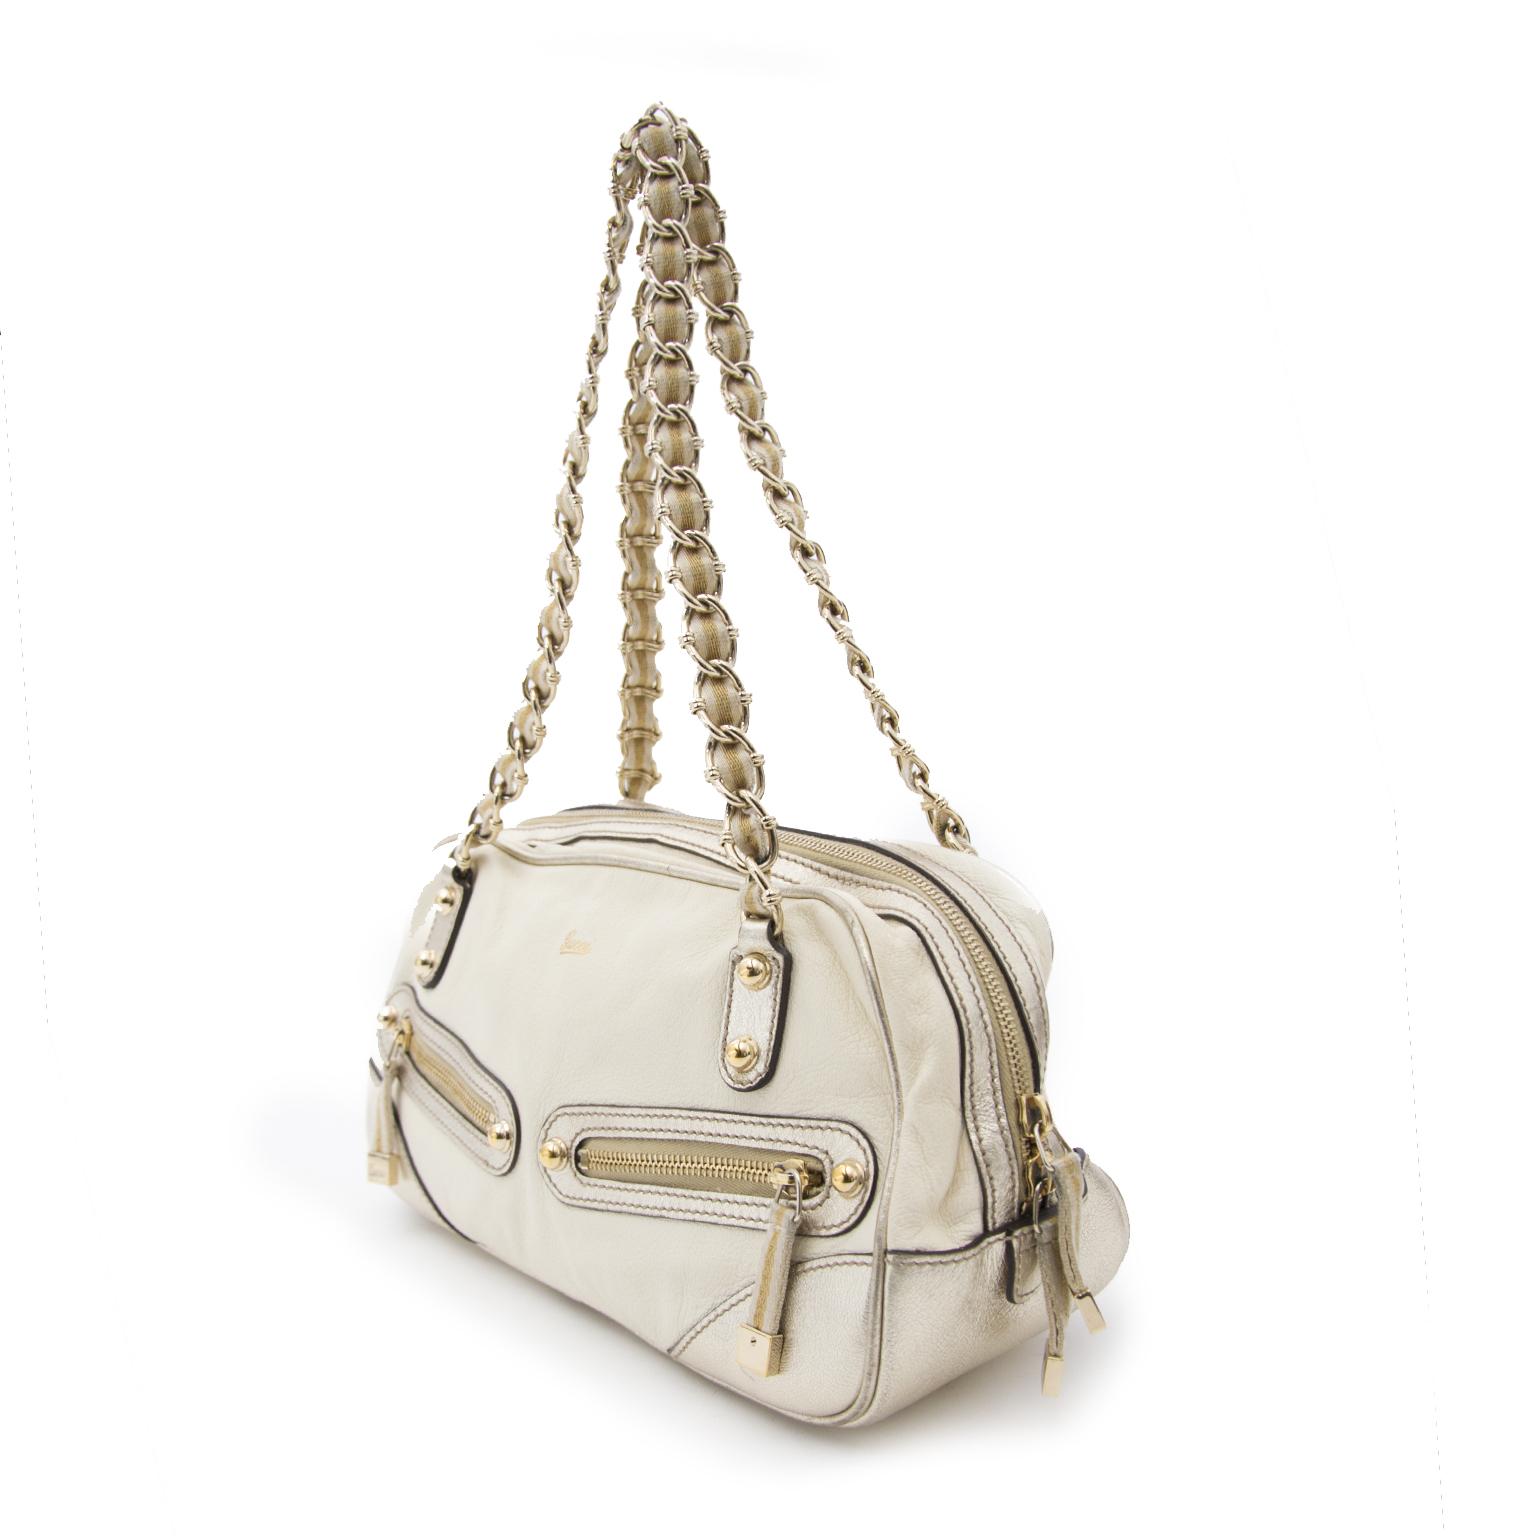 acheter enligne Gucci Gold Cream sac a main